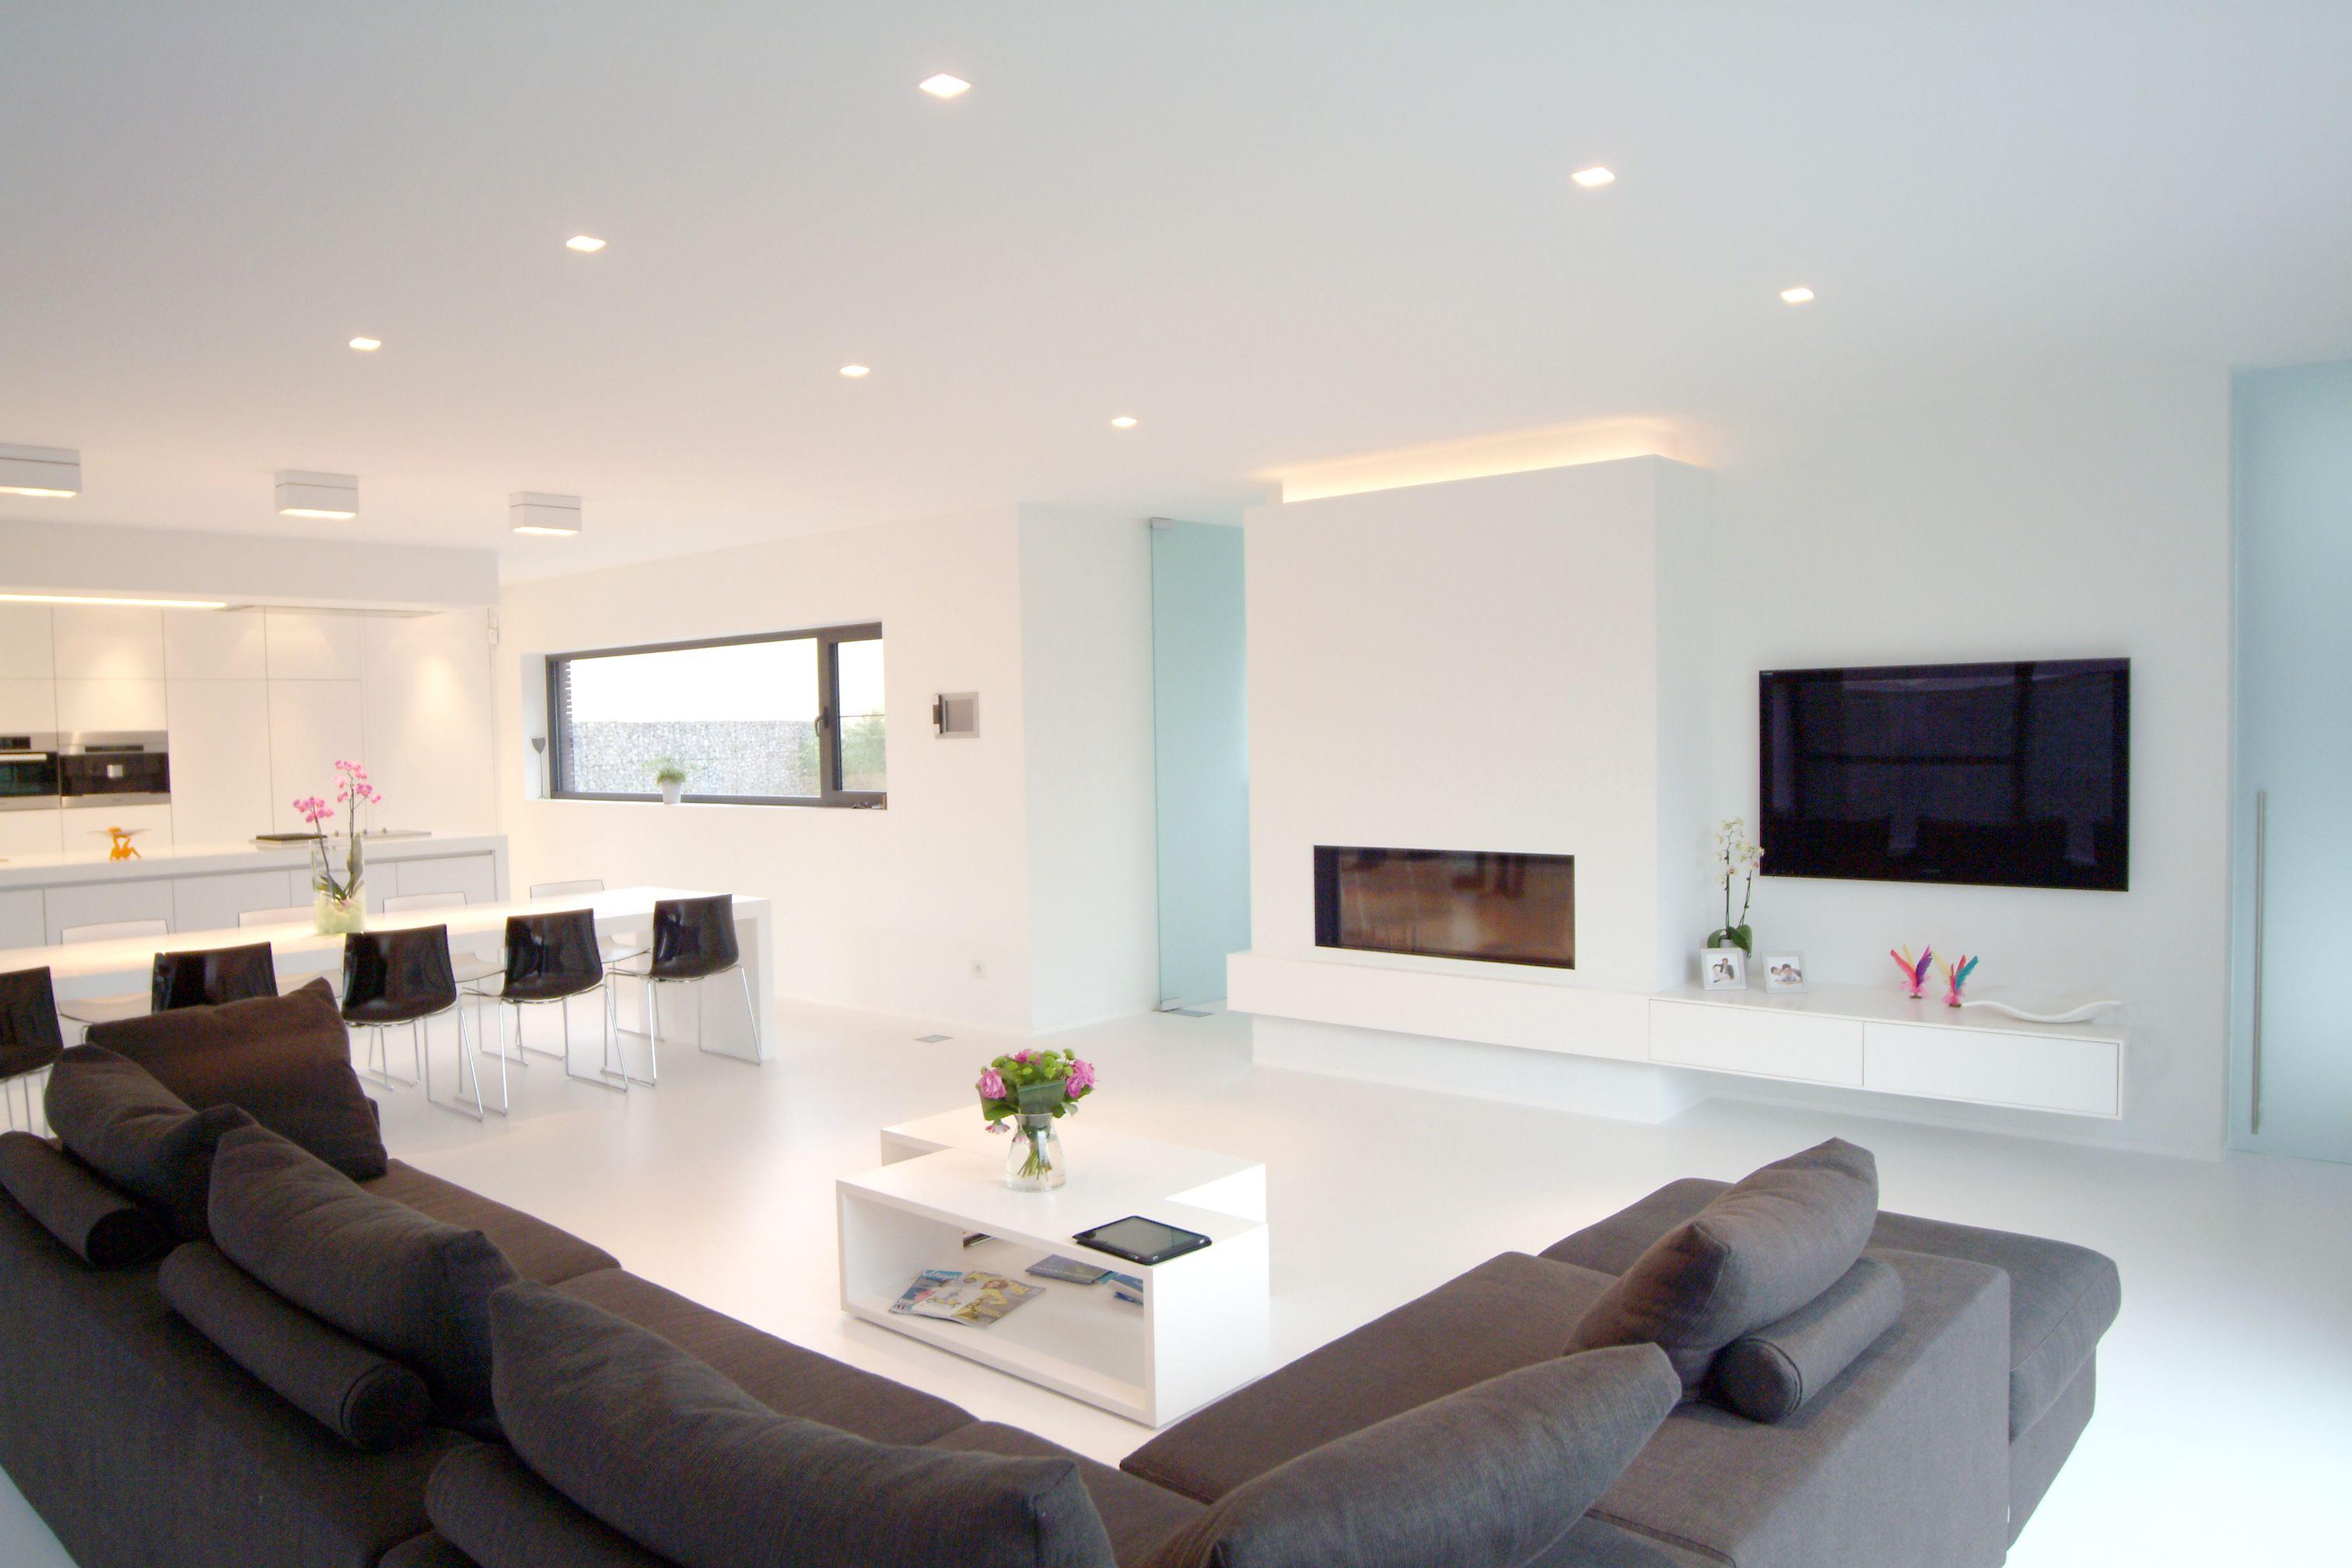 Modern interieur open keuken met kookeiland solid surface